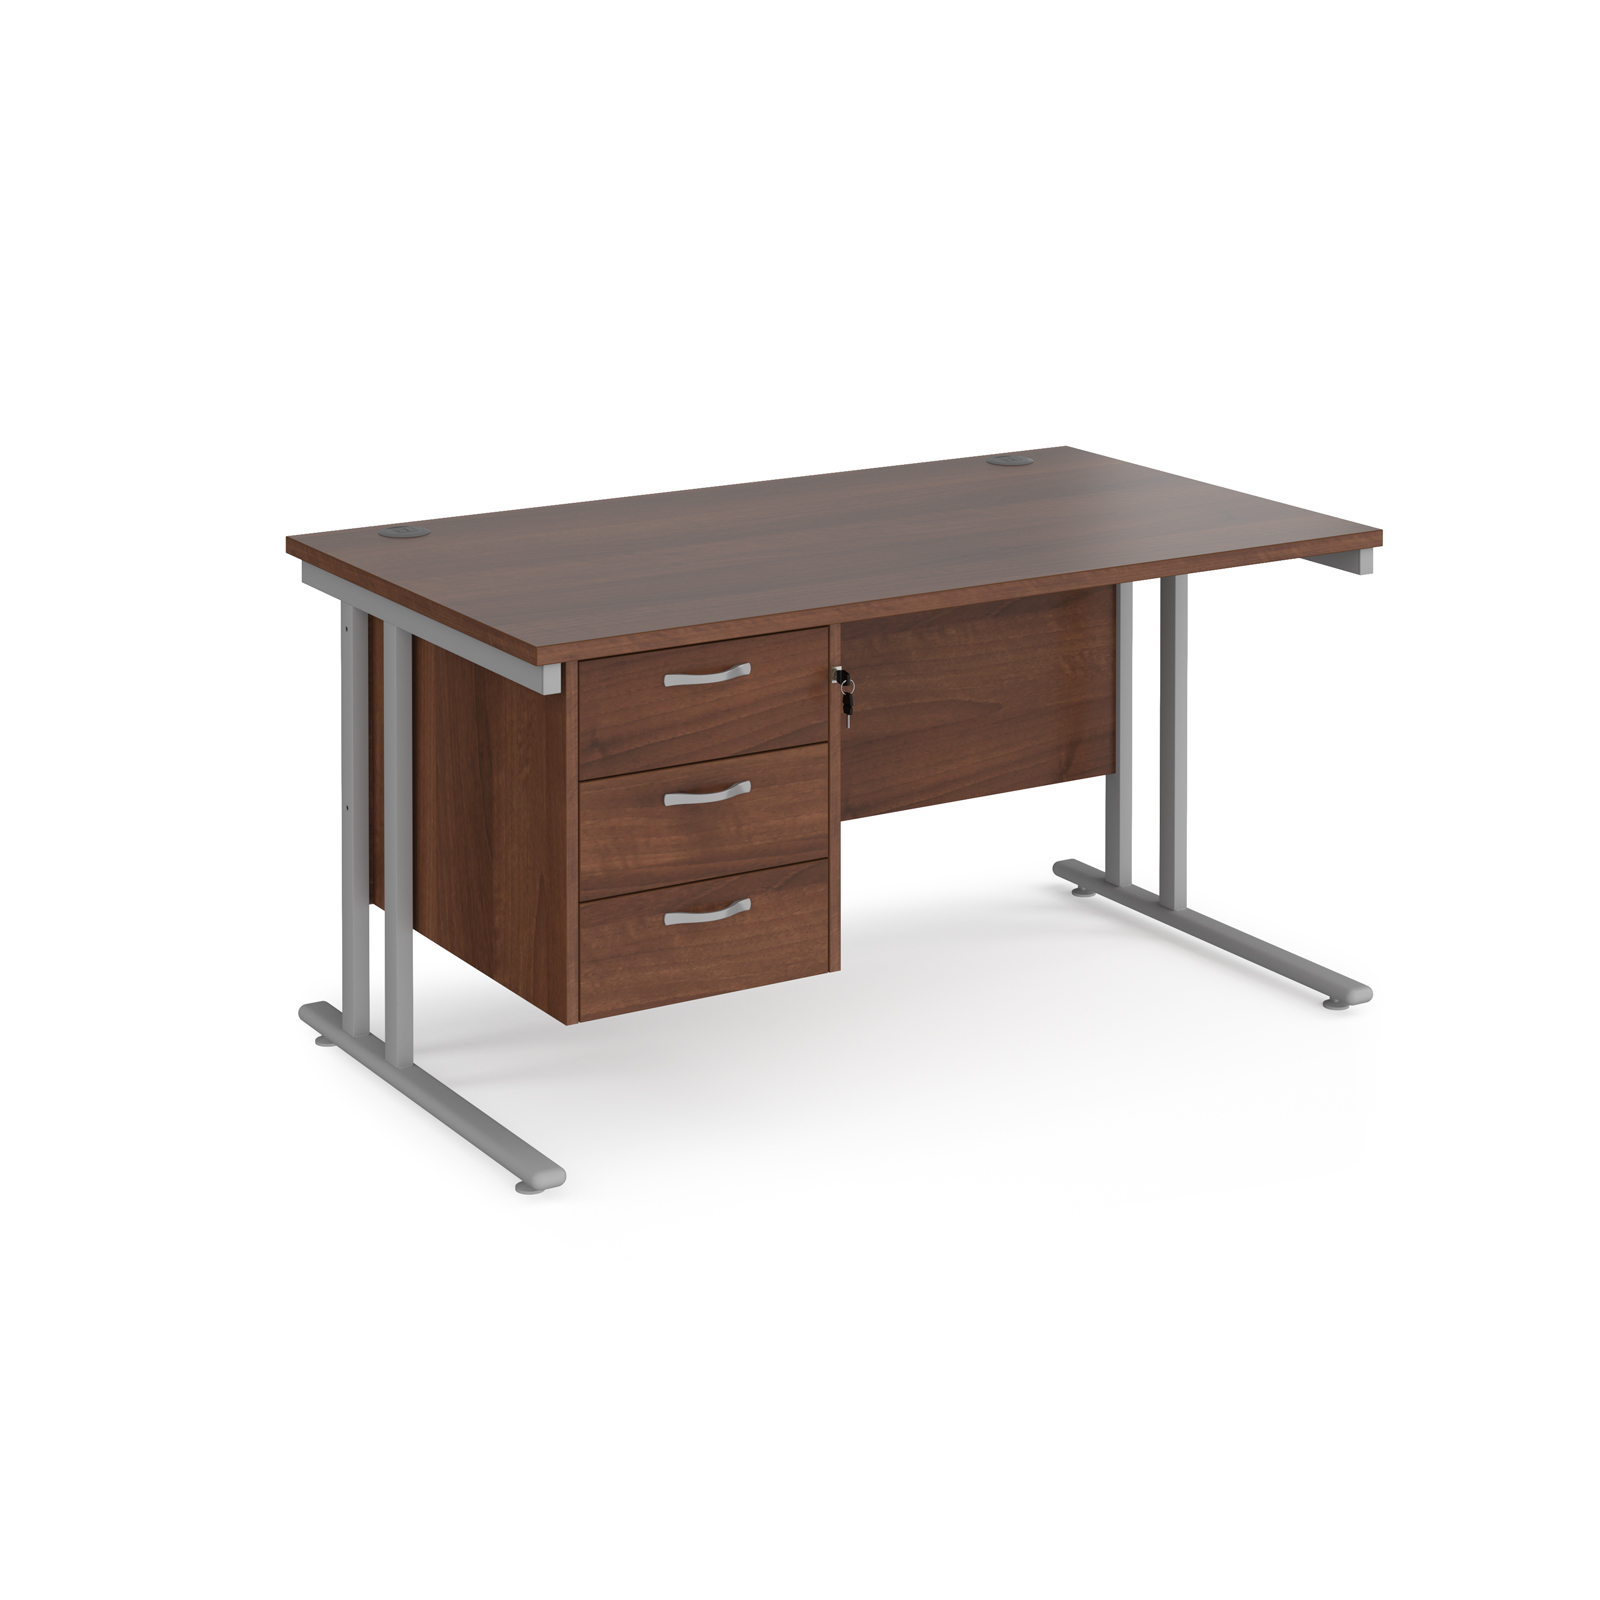 Rectangular Desks Maestro 25 straight desk 1400mm x 800mm with 3 drawer pedestal - silver cantilever leg frame, walnut top